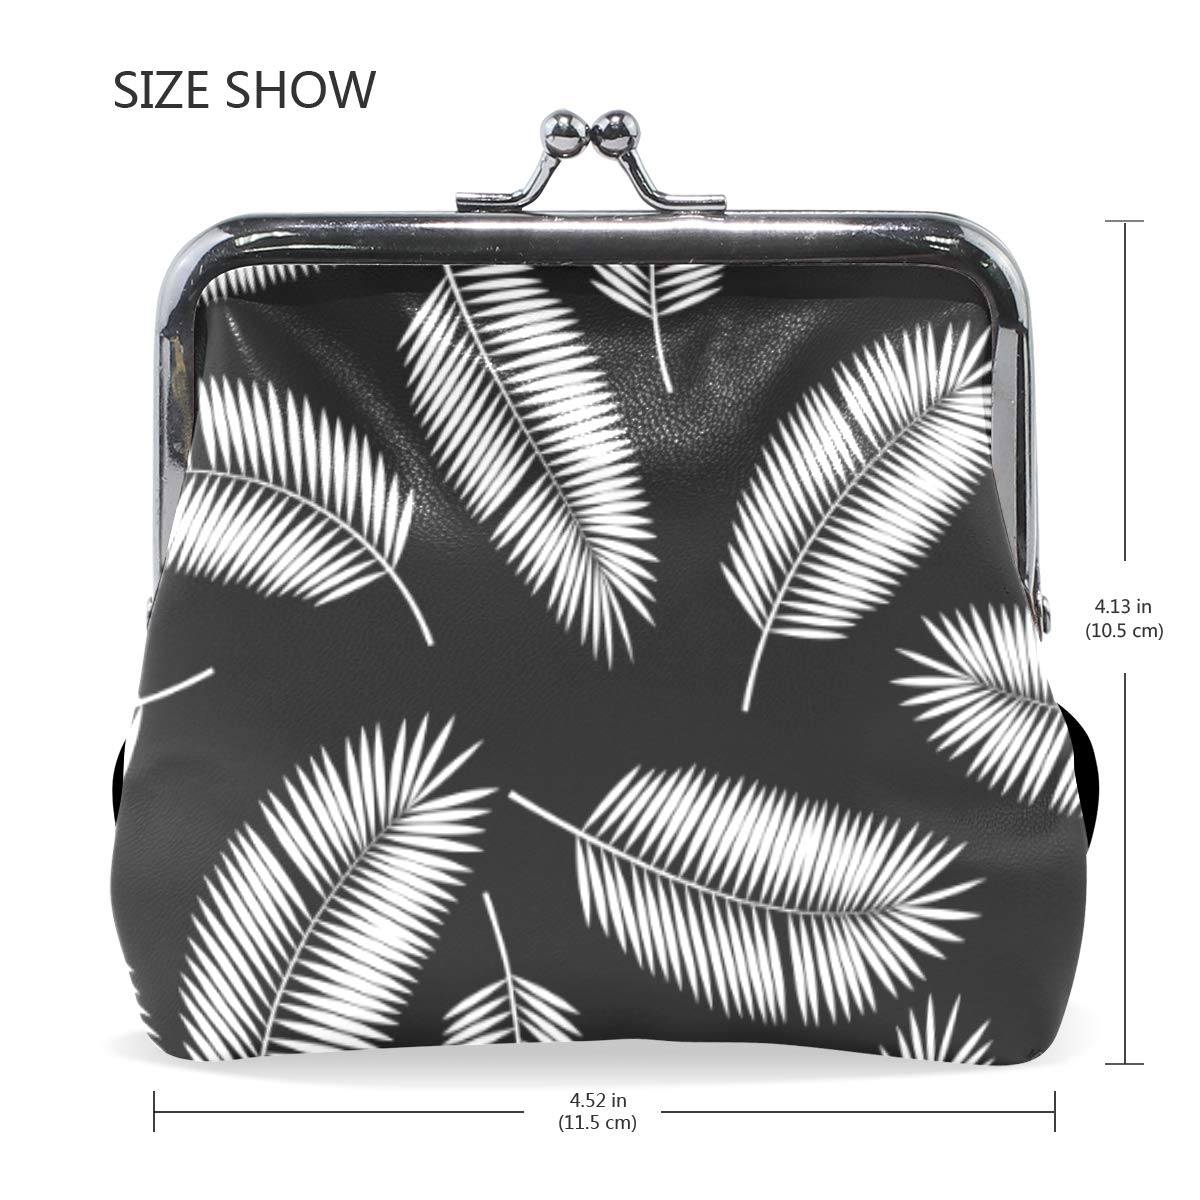 WIHVE Fashion Womens Coin Purse Tropical White Palm Leafs Vintage Pouch Mini Purse Wallets